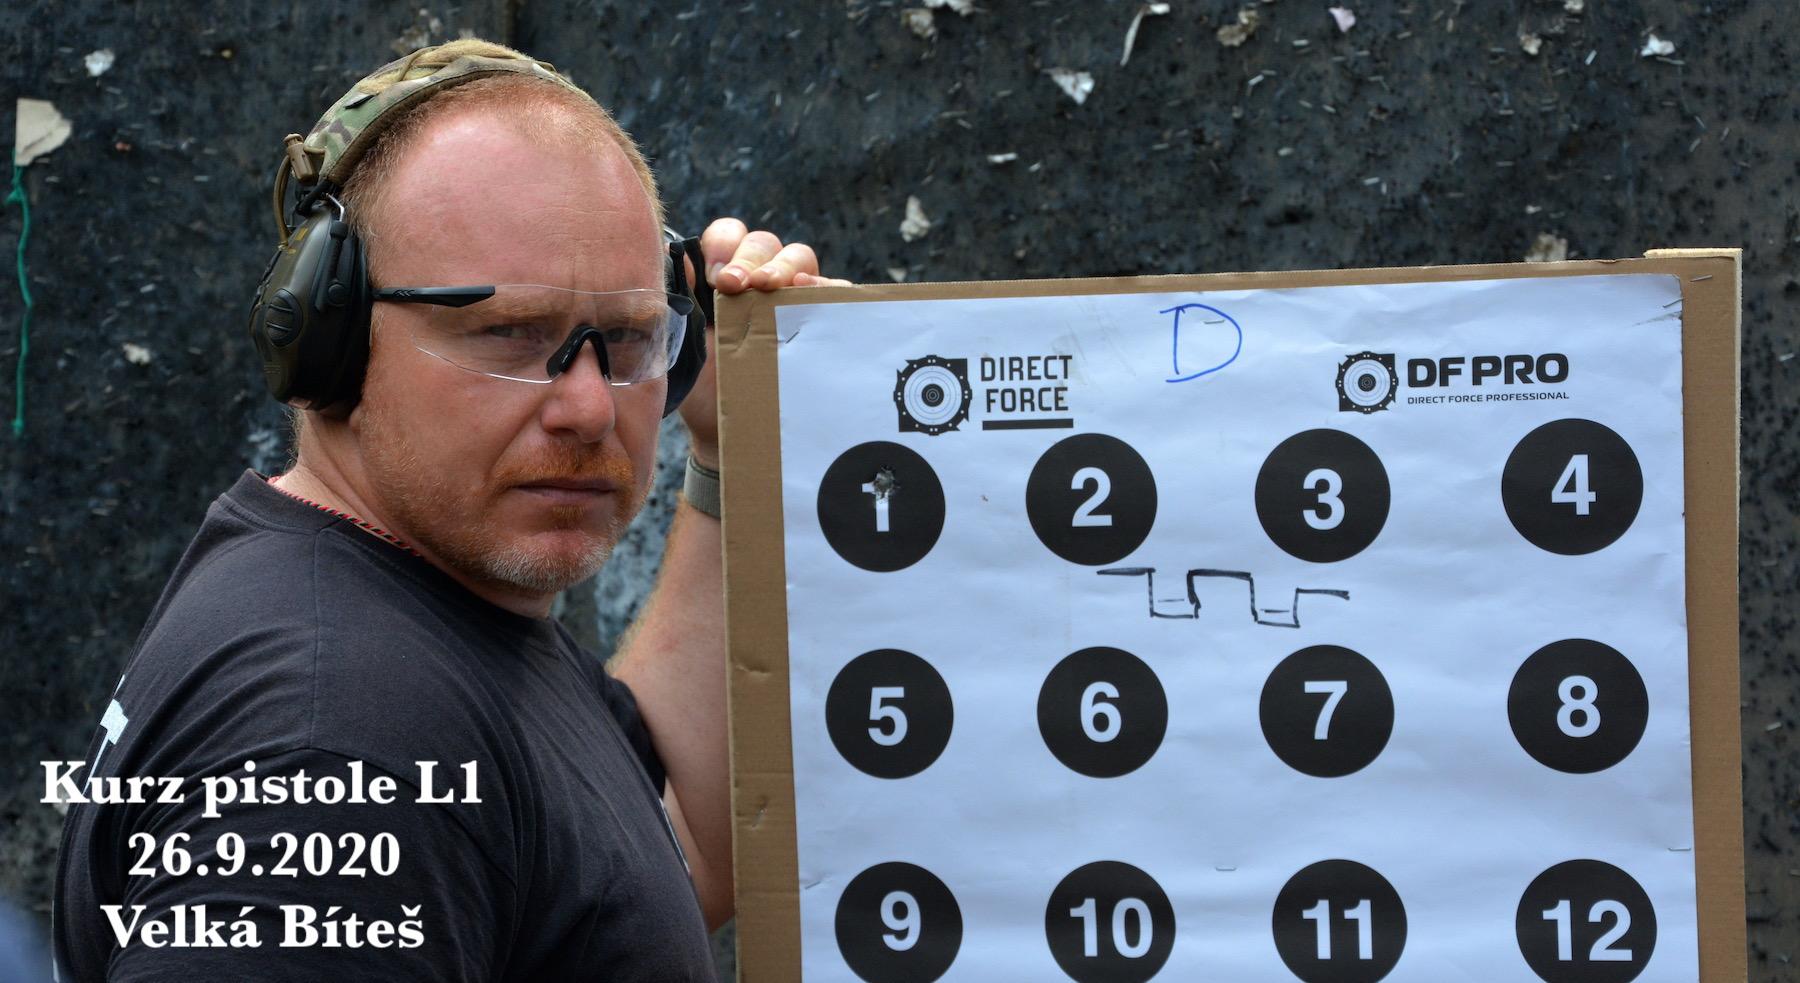 Kurz pistole L1 dne 26.9.2020